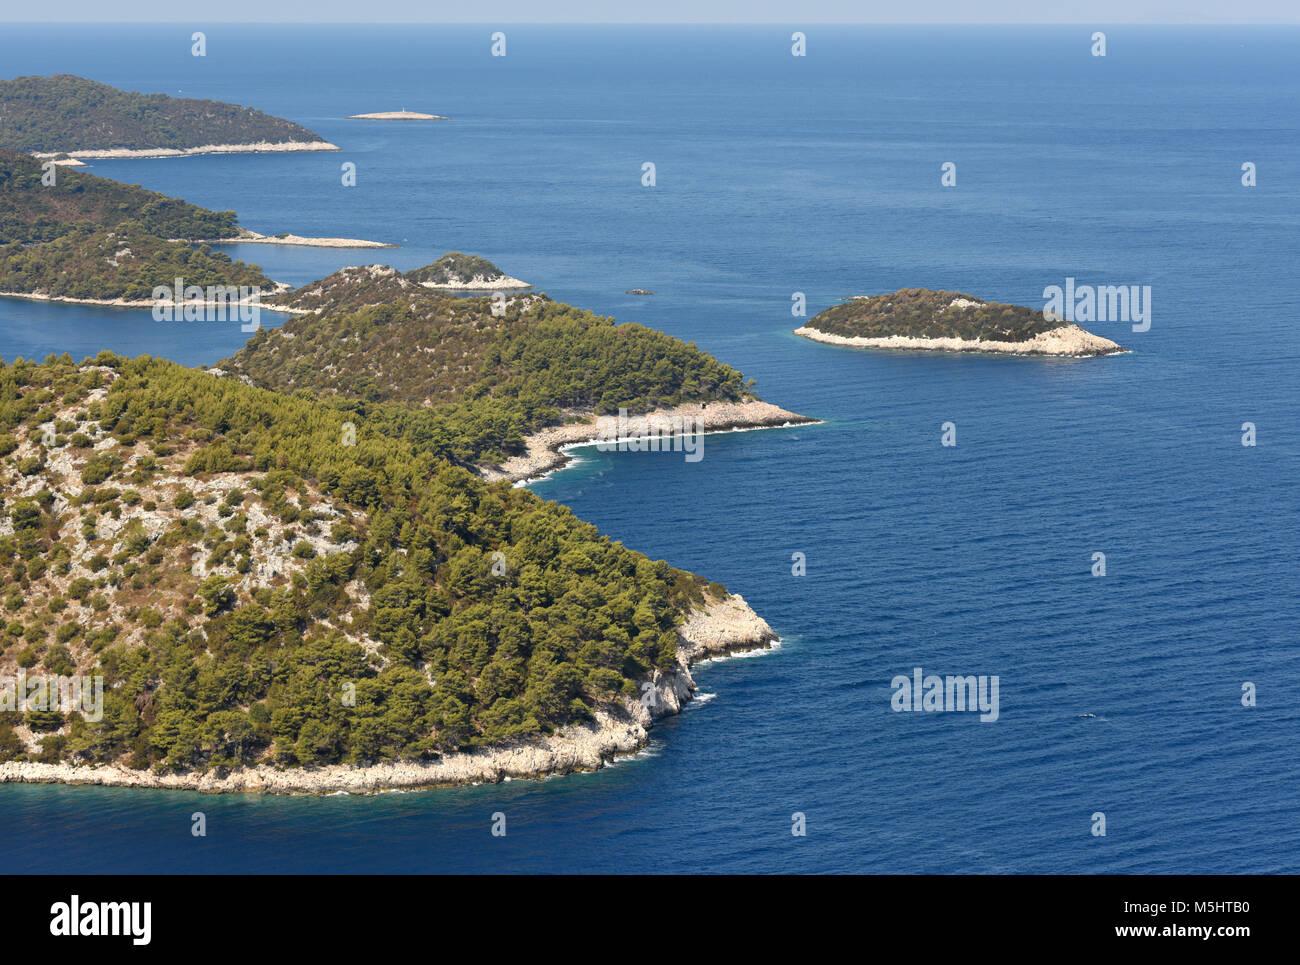 Lastovo islands, Croatia. - Stock Image